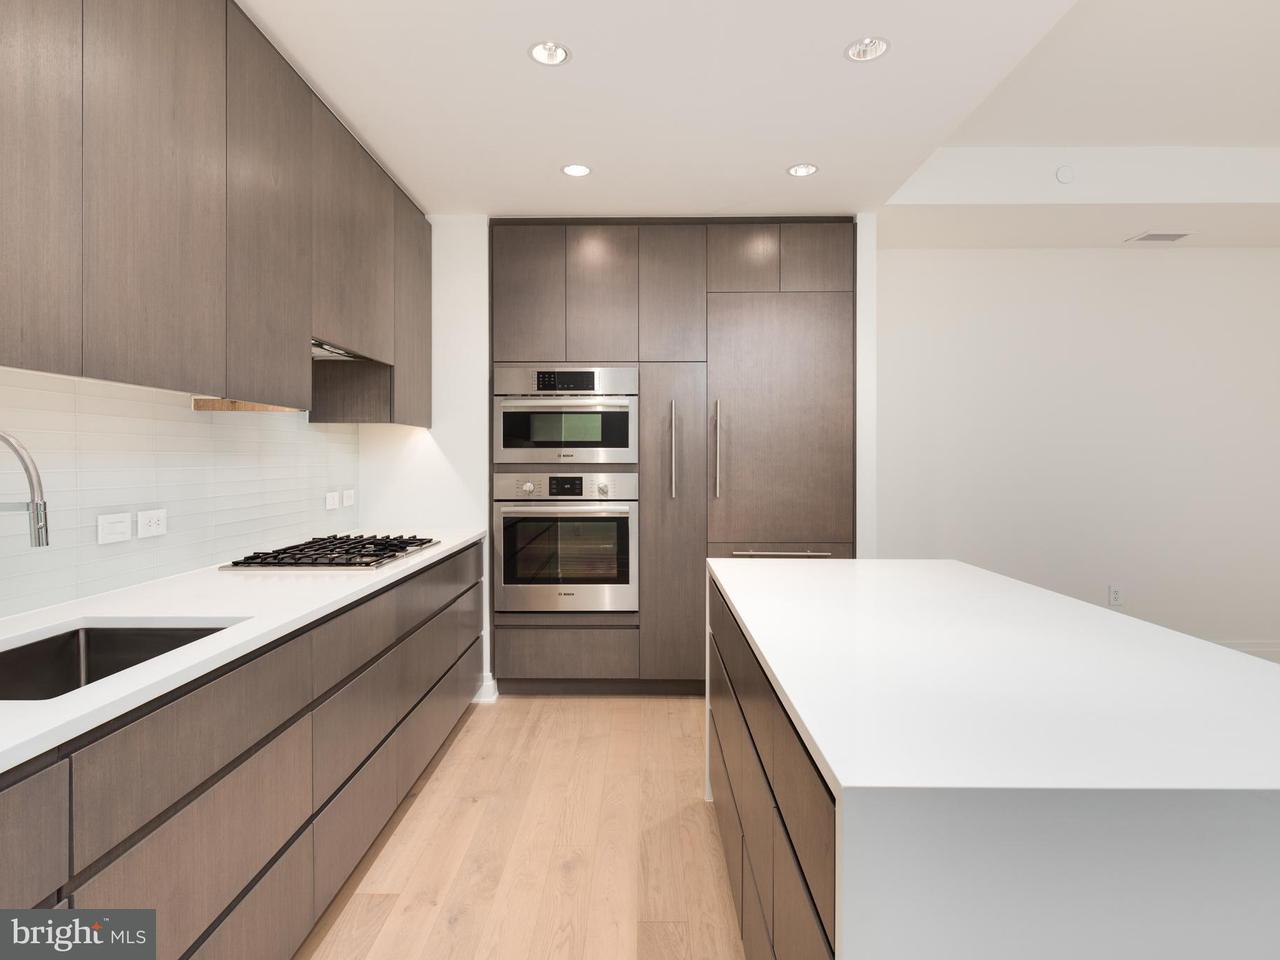 Condominium for Rent at 2501 M NW #504 Washington, District Of Columbia 20037 United States